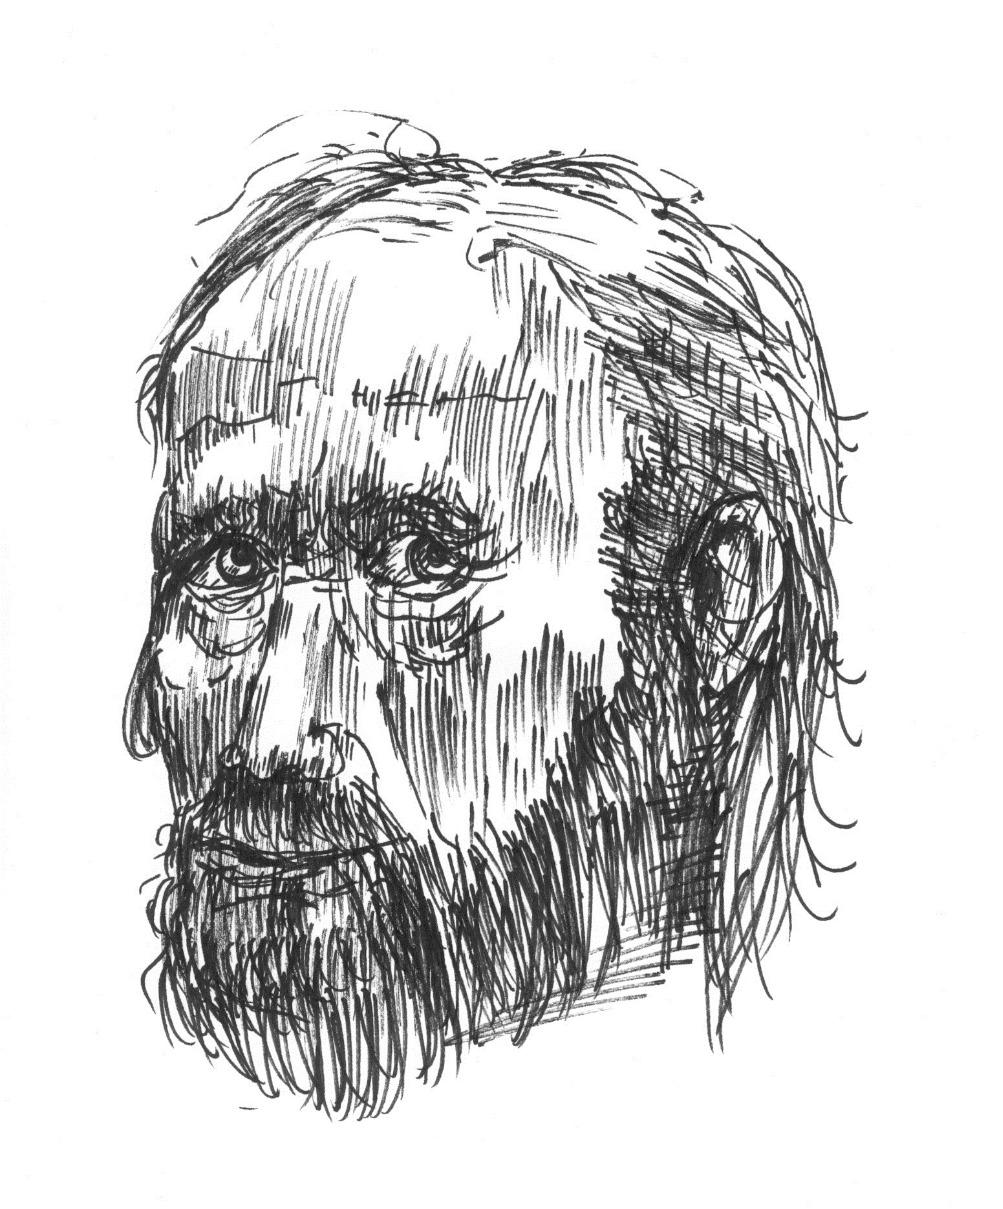 Cro-Magnon Man, 17,000 years